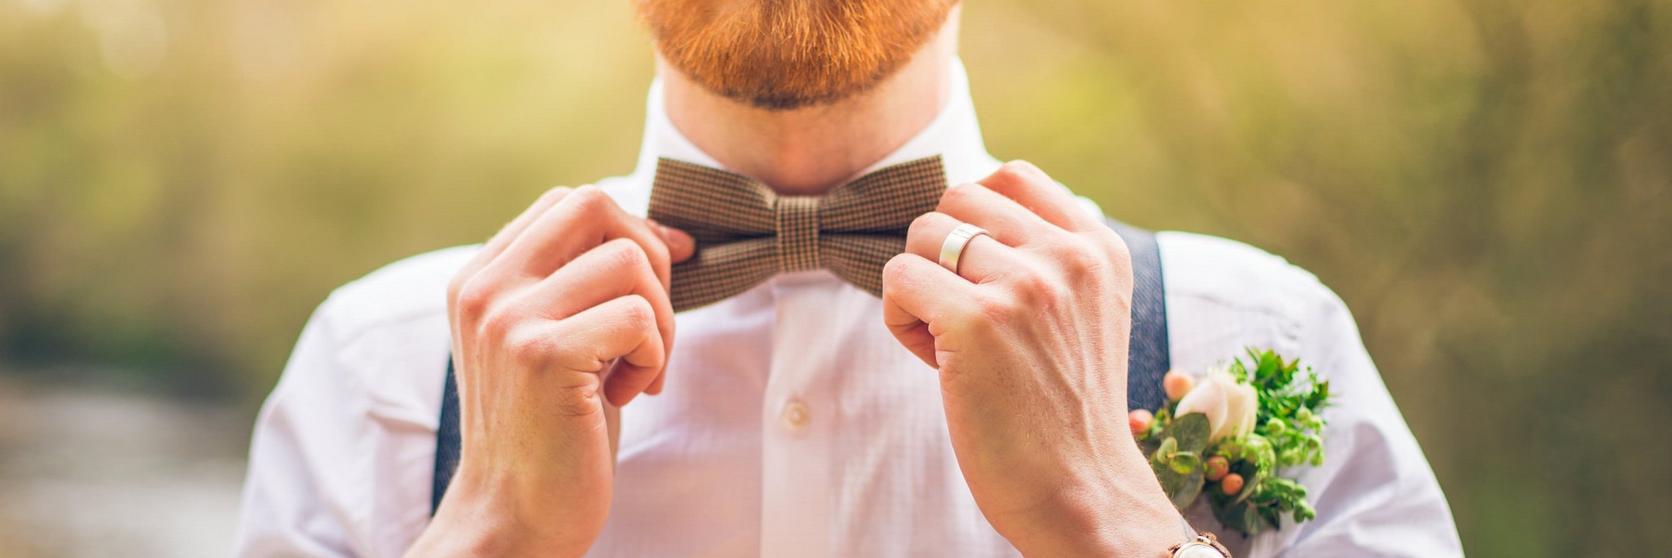 201908_wedding_new_husband-crop